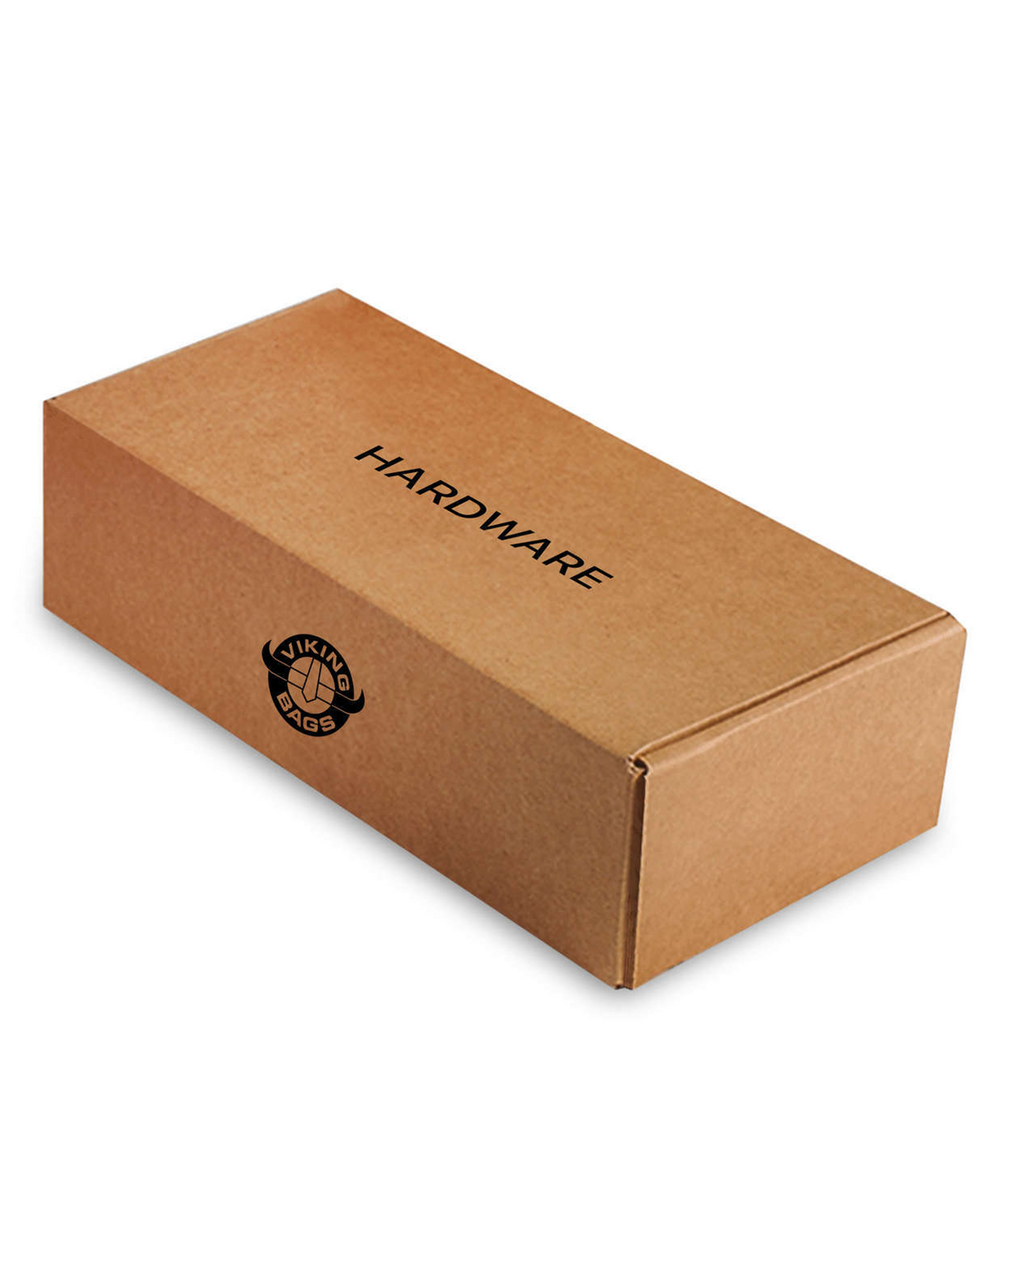 Honda 1100 Shadow Sabre Slant Large Motorcycle Saddlebags Hardware Box